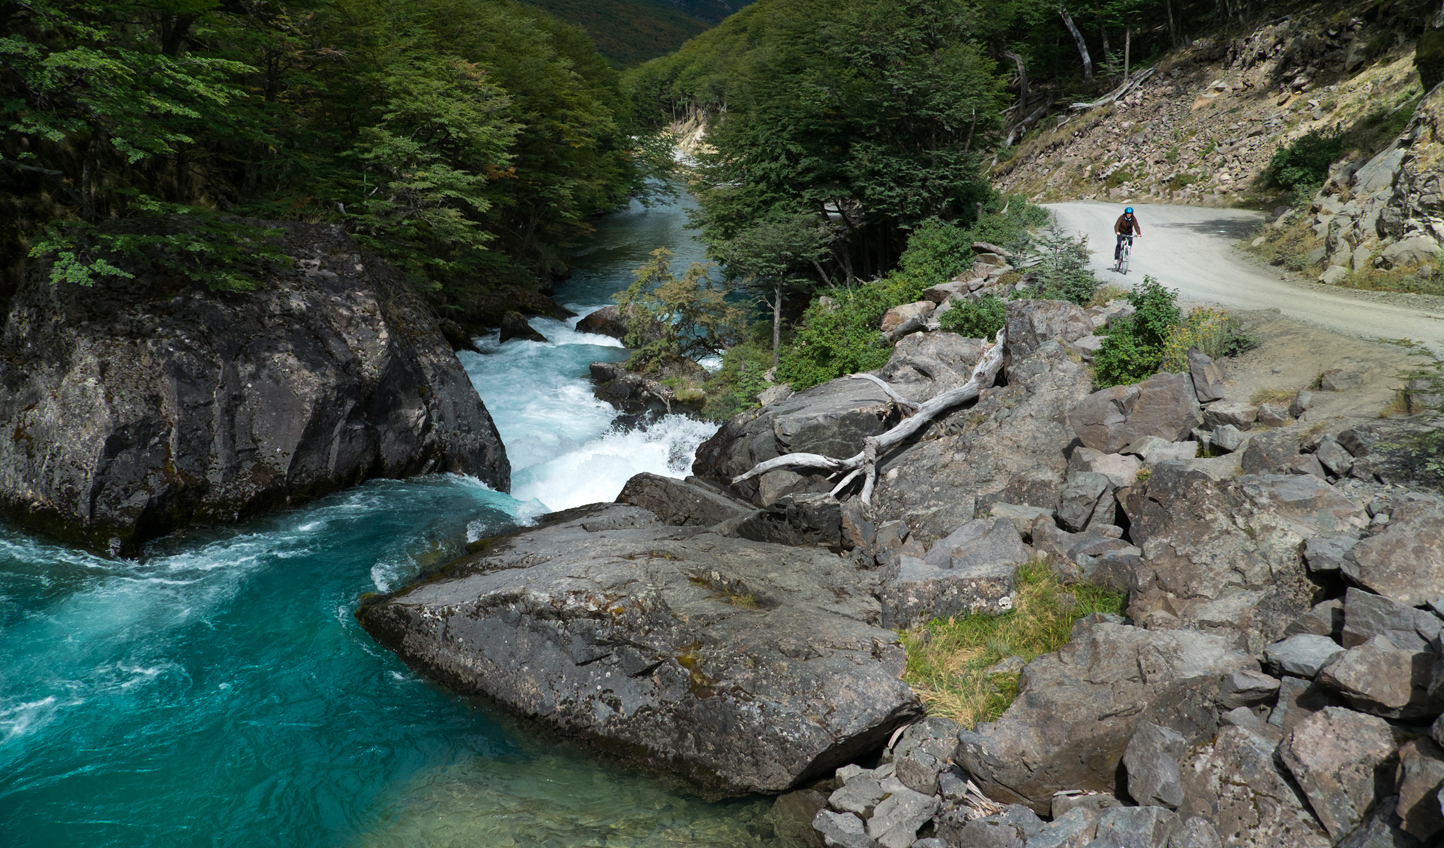 Mountain bike through this remote wilderness